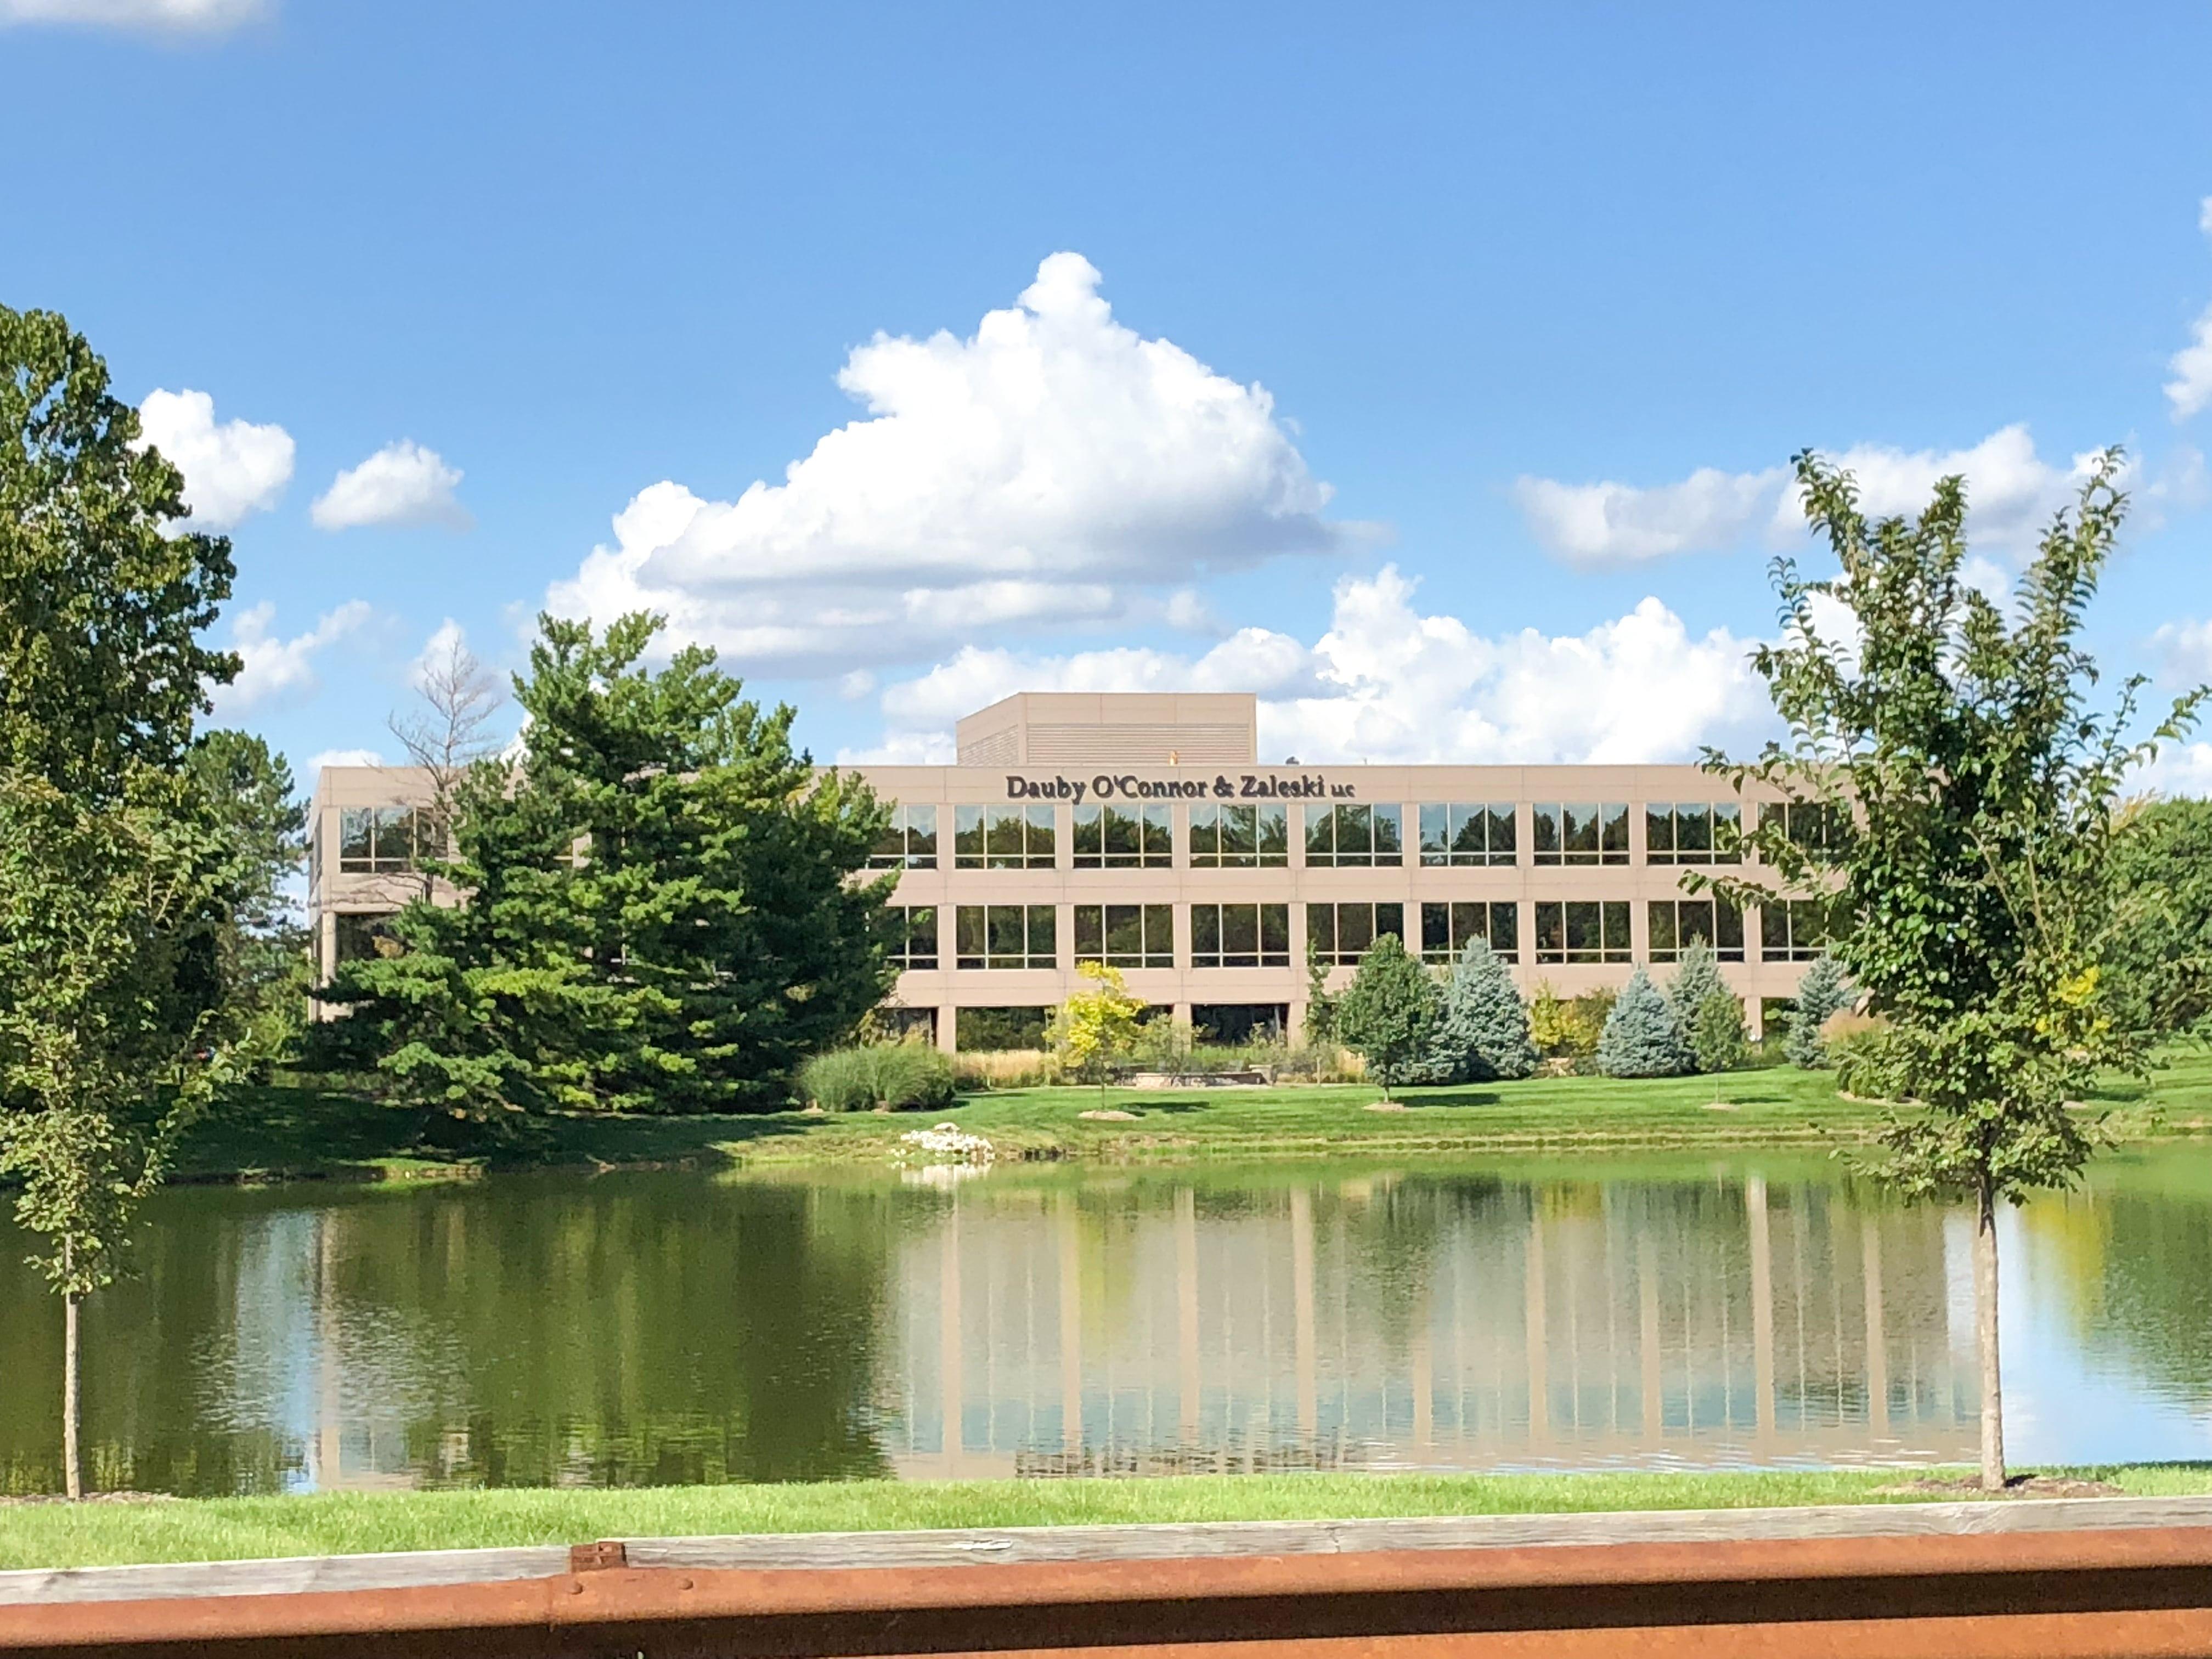 doz-exterior-building-image